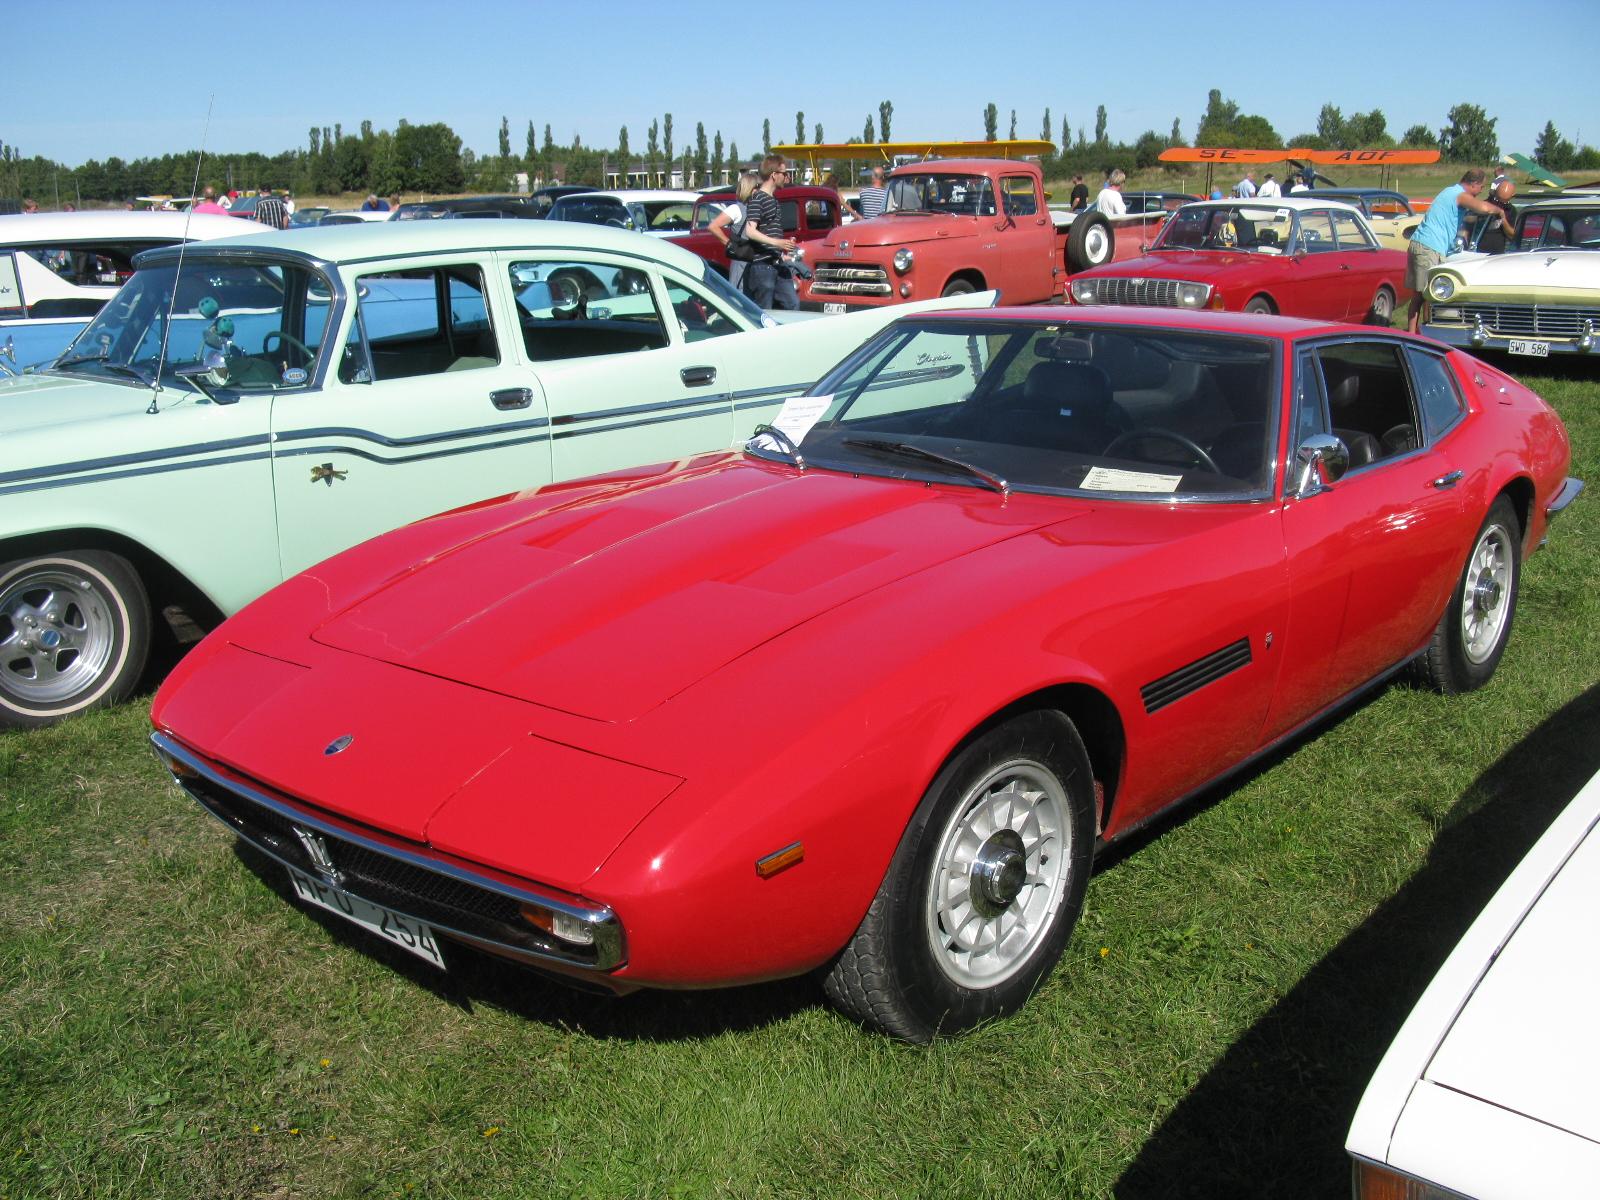 Maserati Ghibli (1967) - Wikipedia